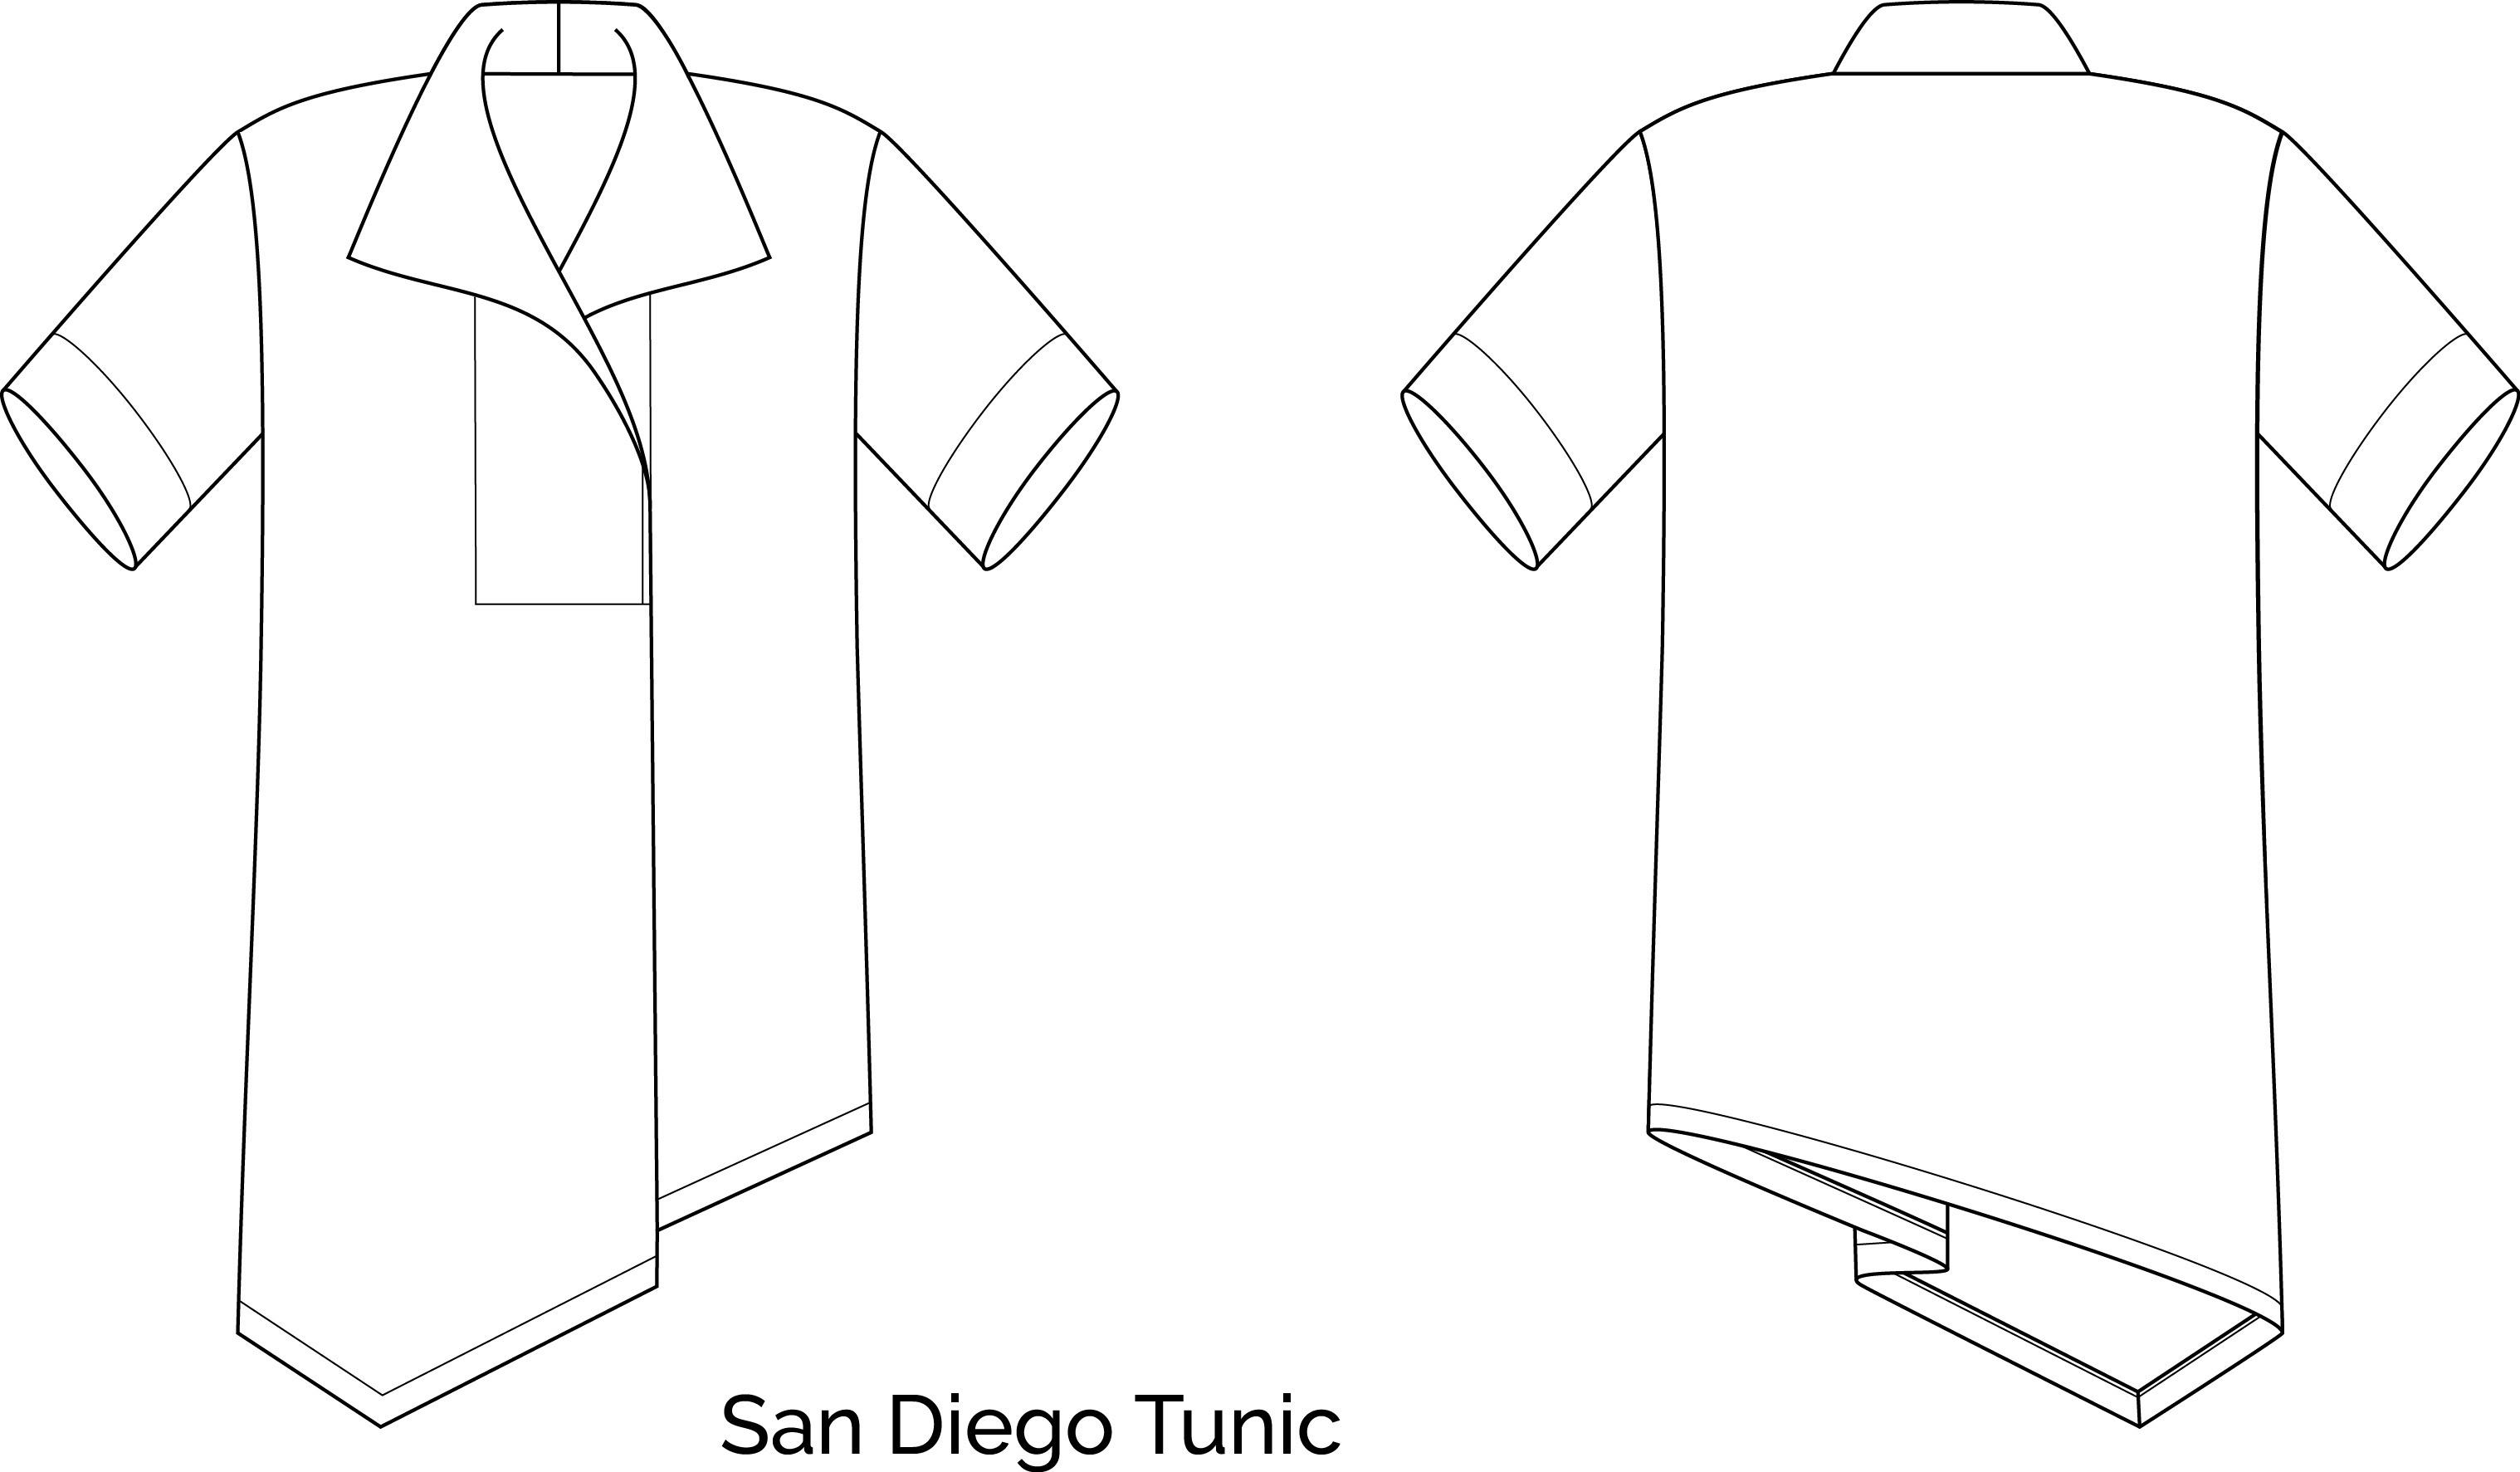 San Diego Tunic